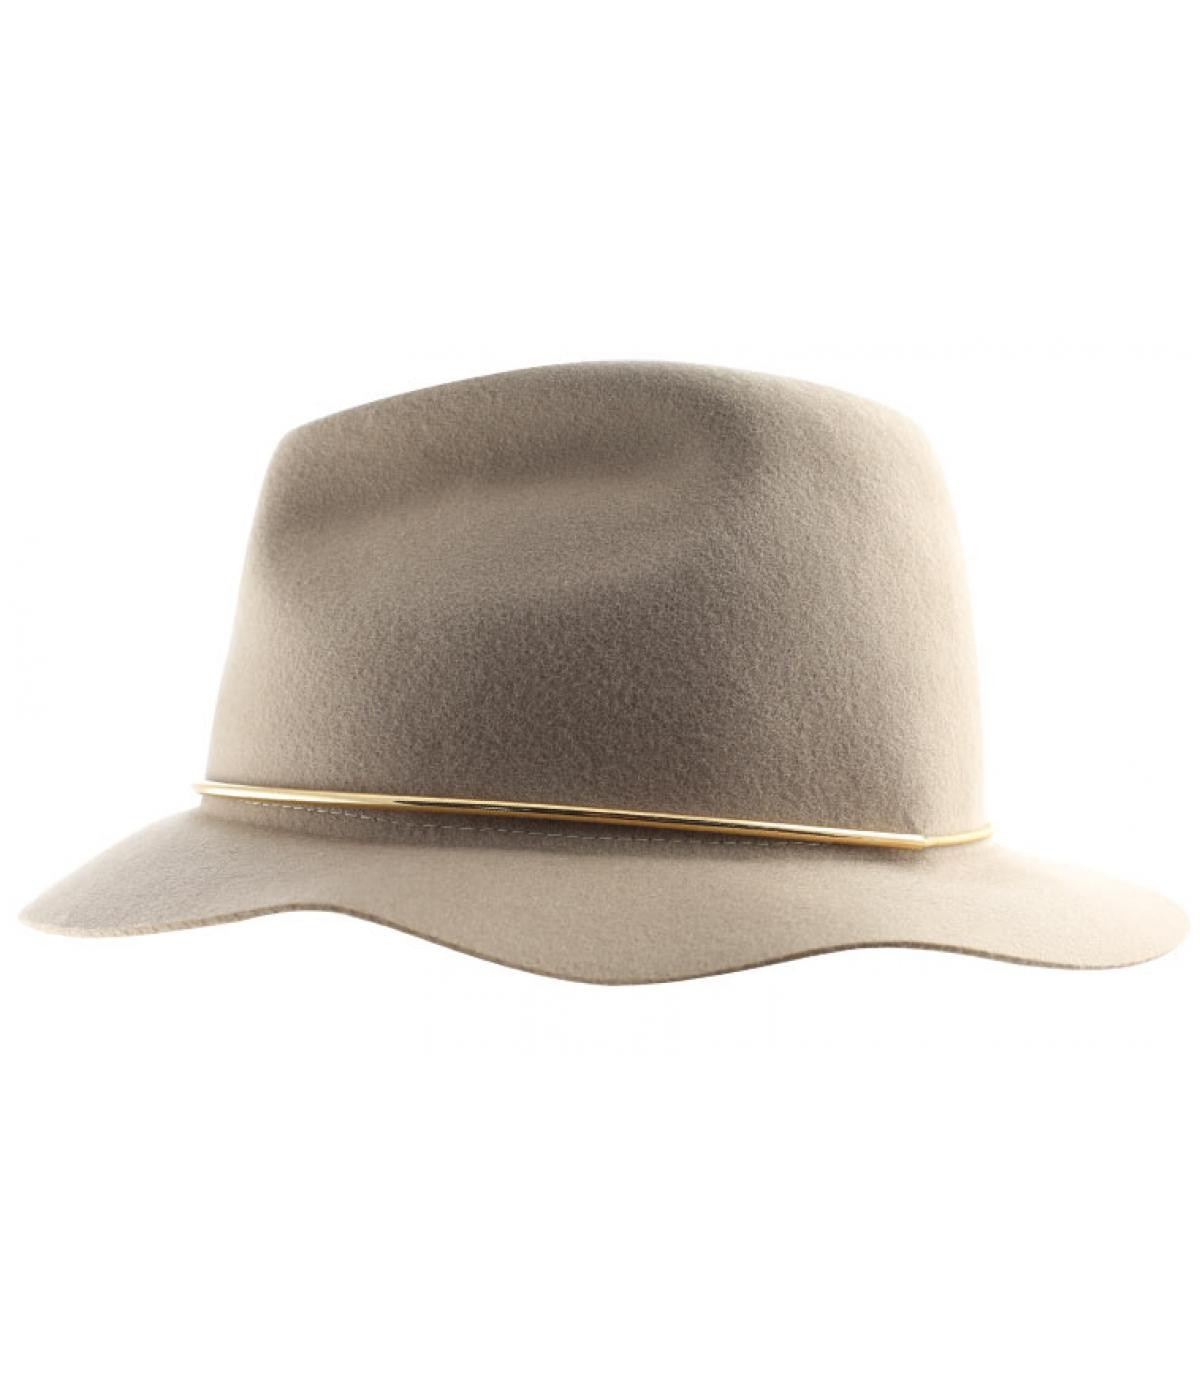 Donne cappello fedora